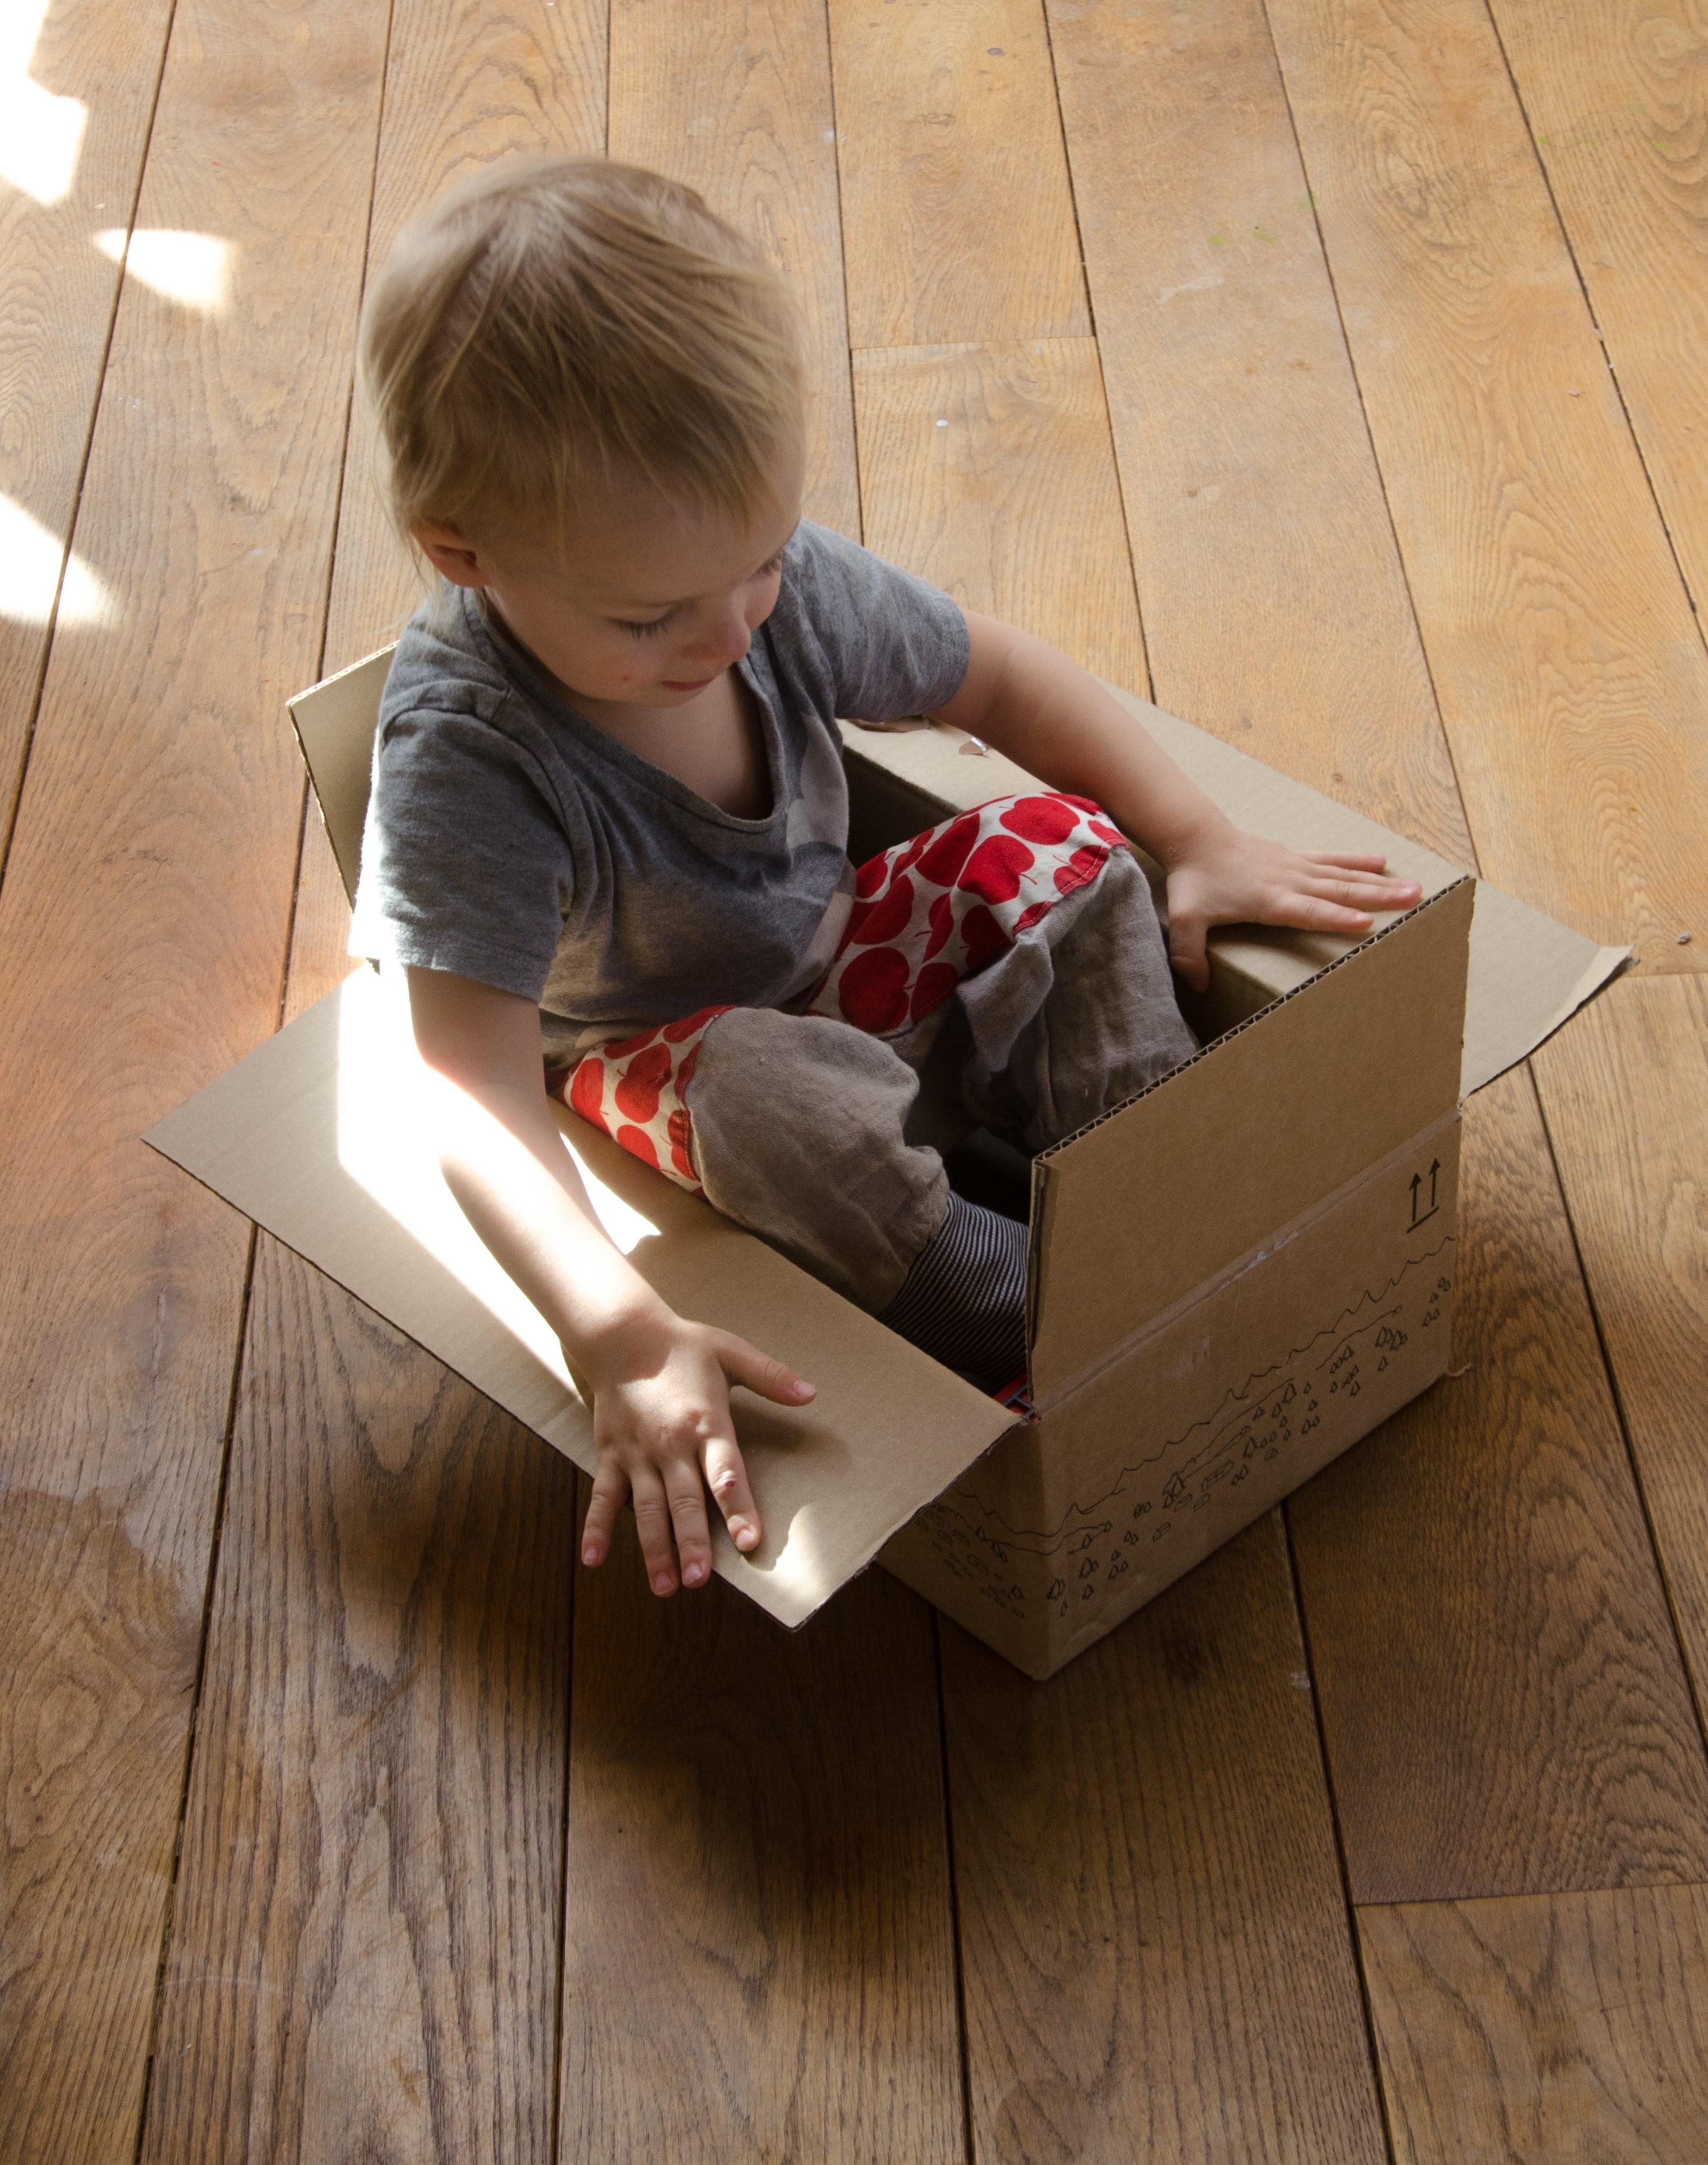 papphaus basteln simple schleich und playmobil holz haus bauen avec anleitung haus basteln et. Black Bedroom Furniture Sets. Home Design Ideas